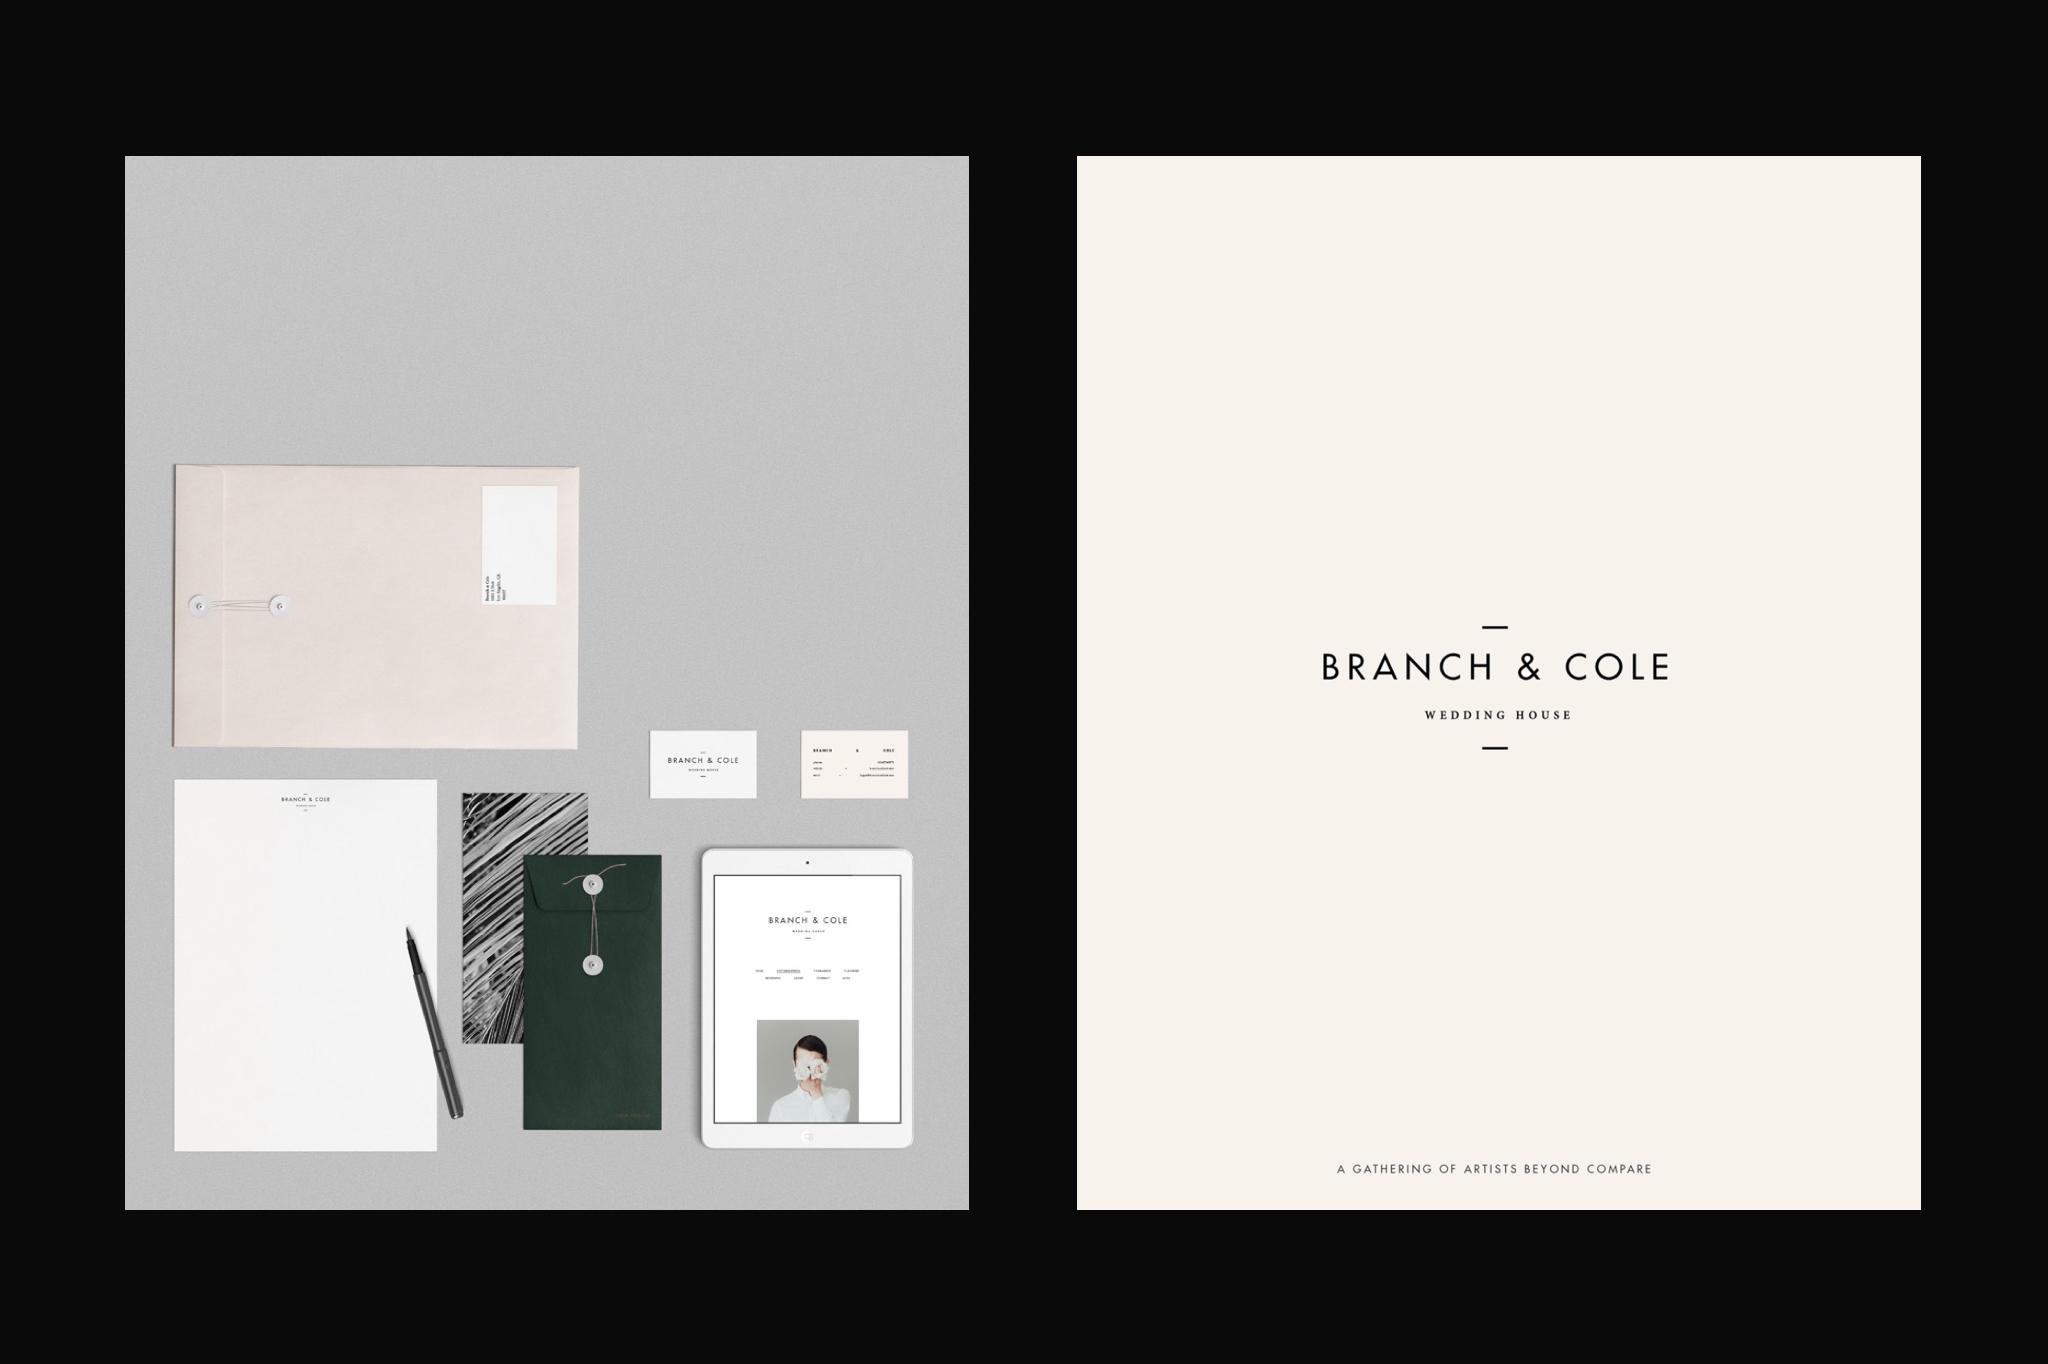 BranchAndCole_5.jpg